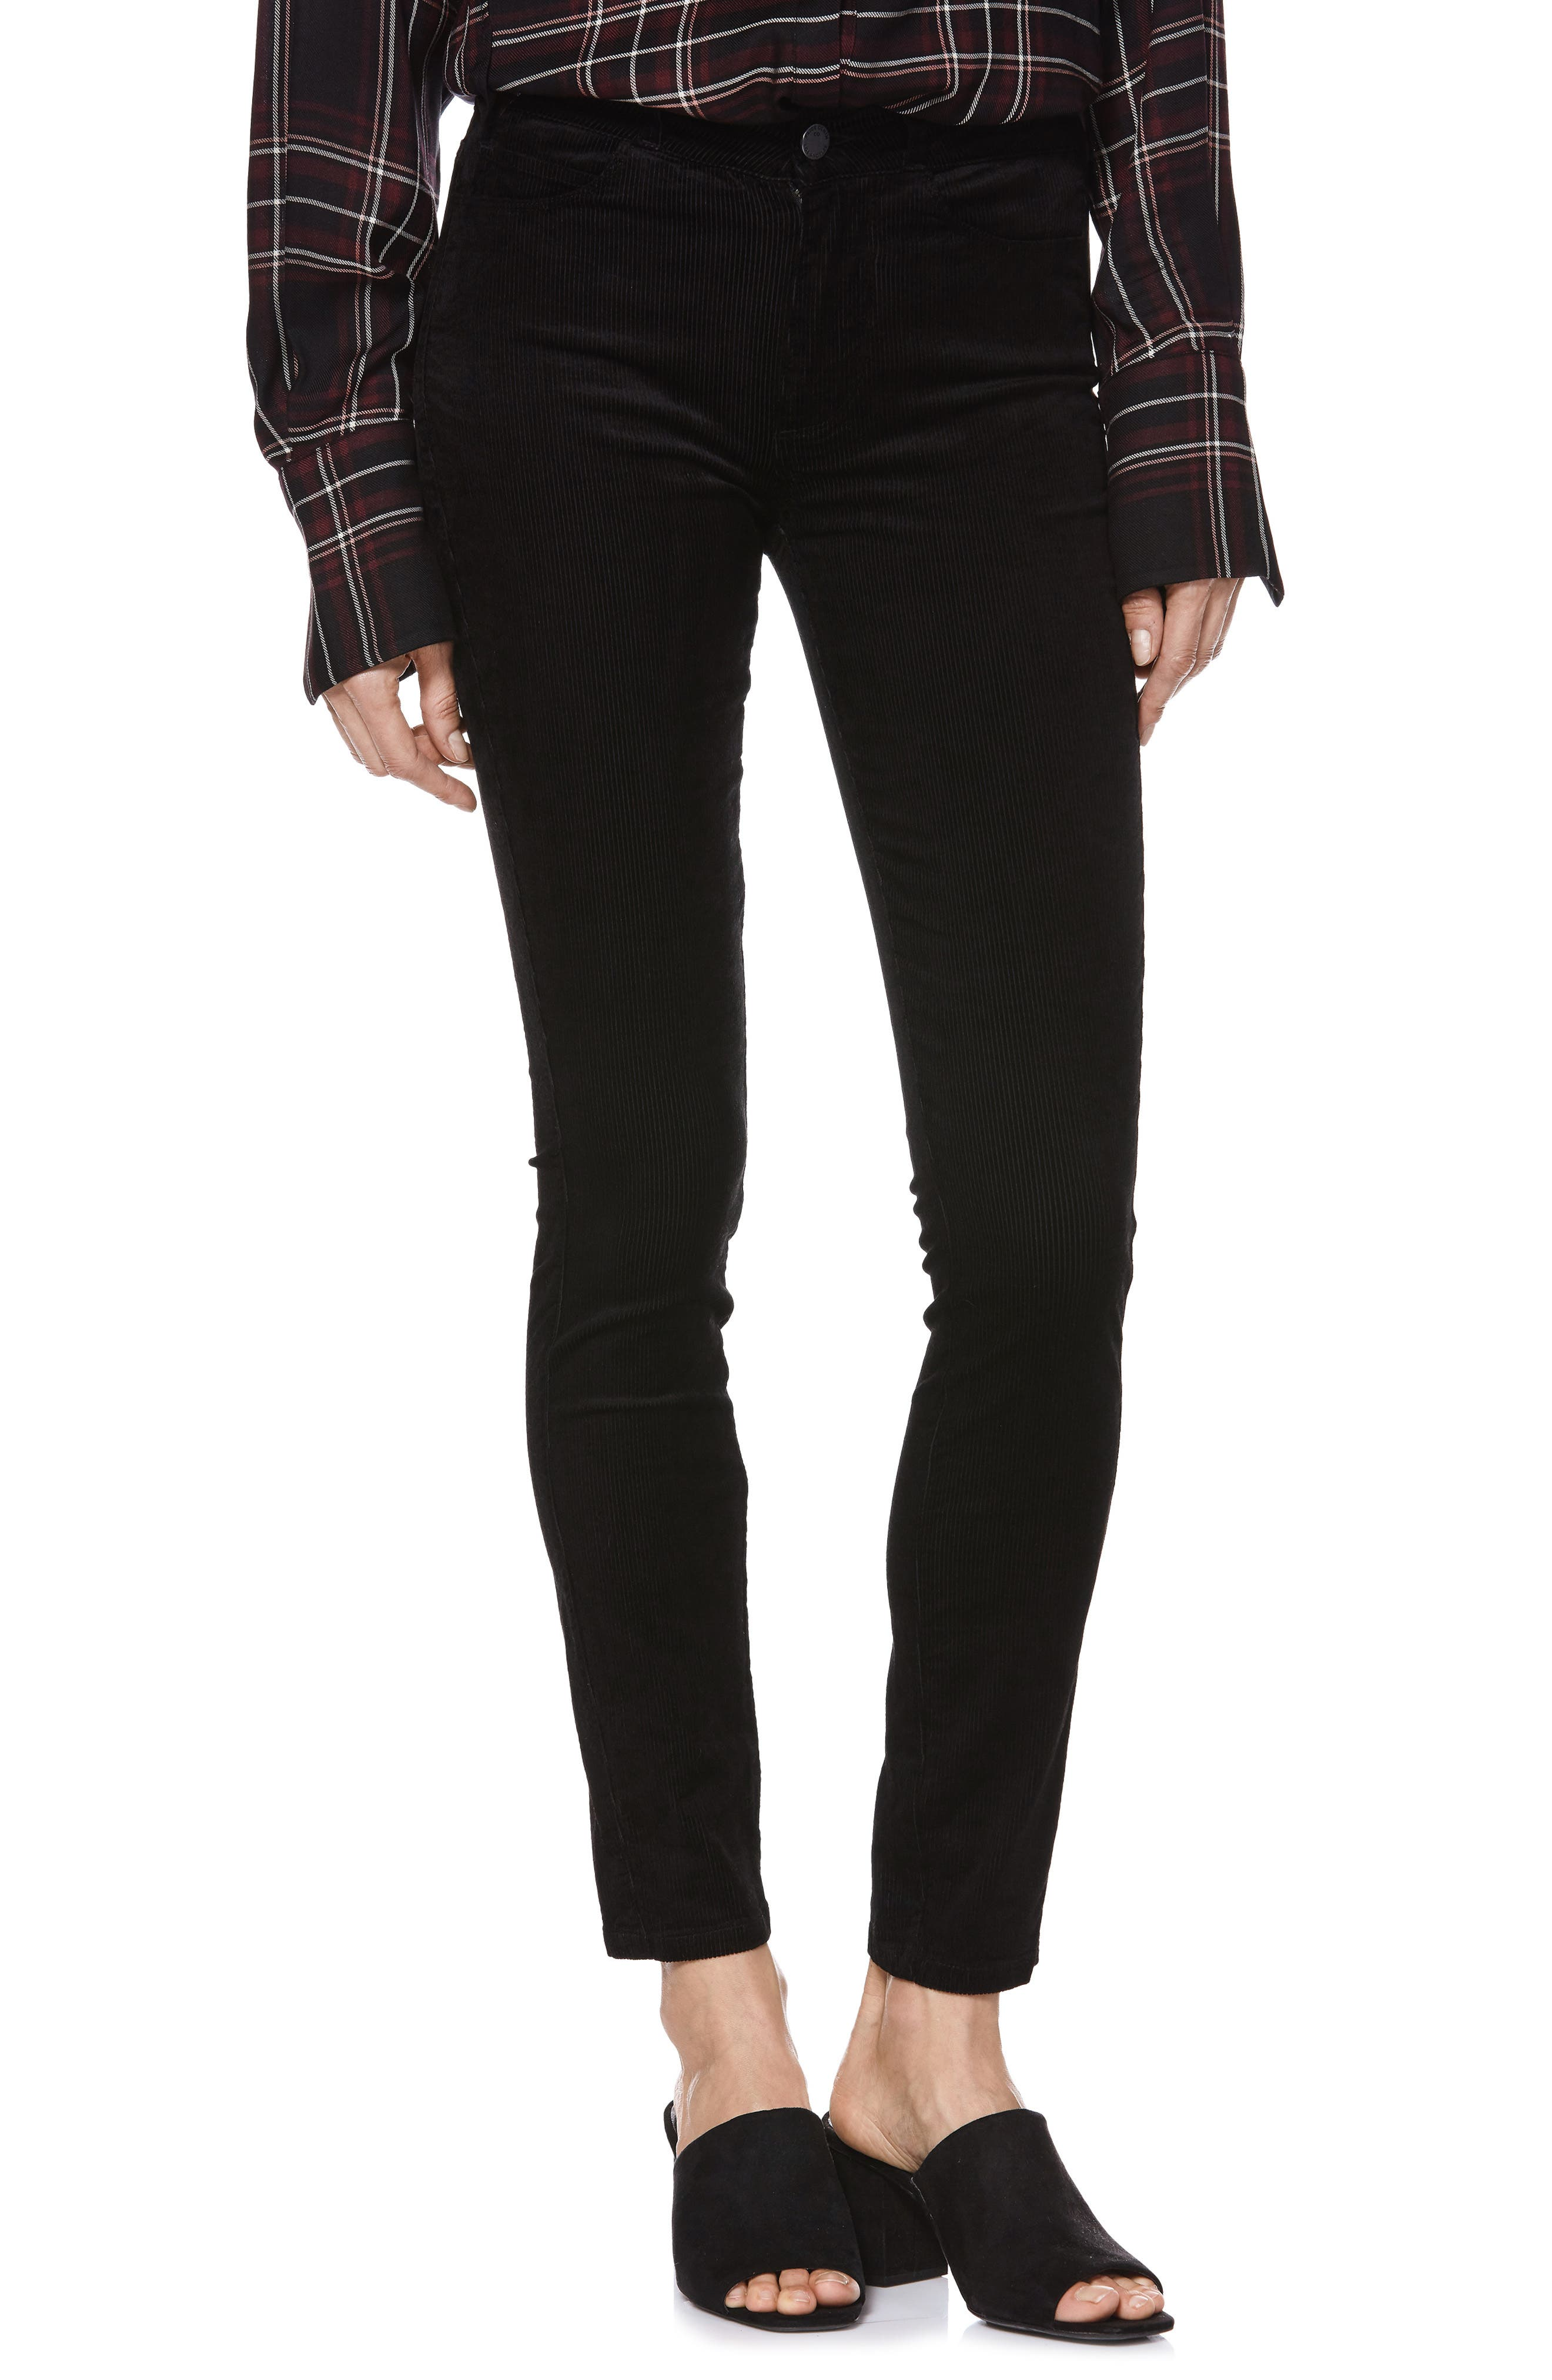 Transcend - Hoxton High Waist Ultra Skinny Jeans,                             Main thumbnail 1, color,                             001